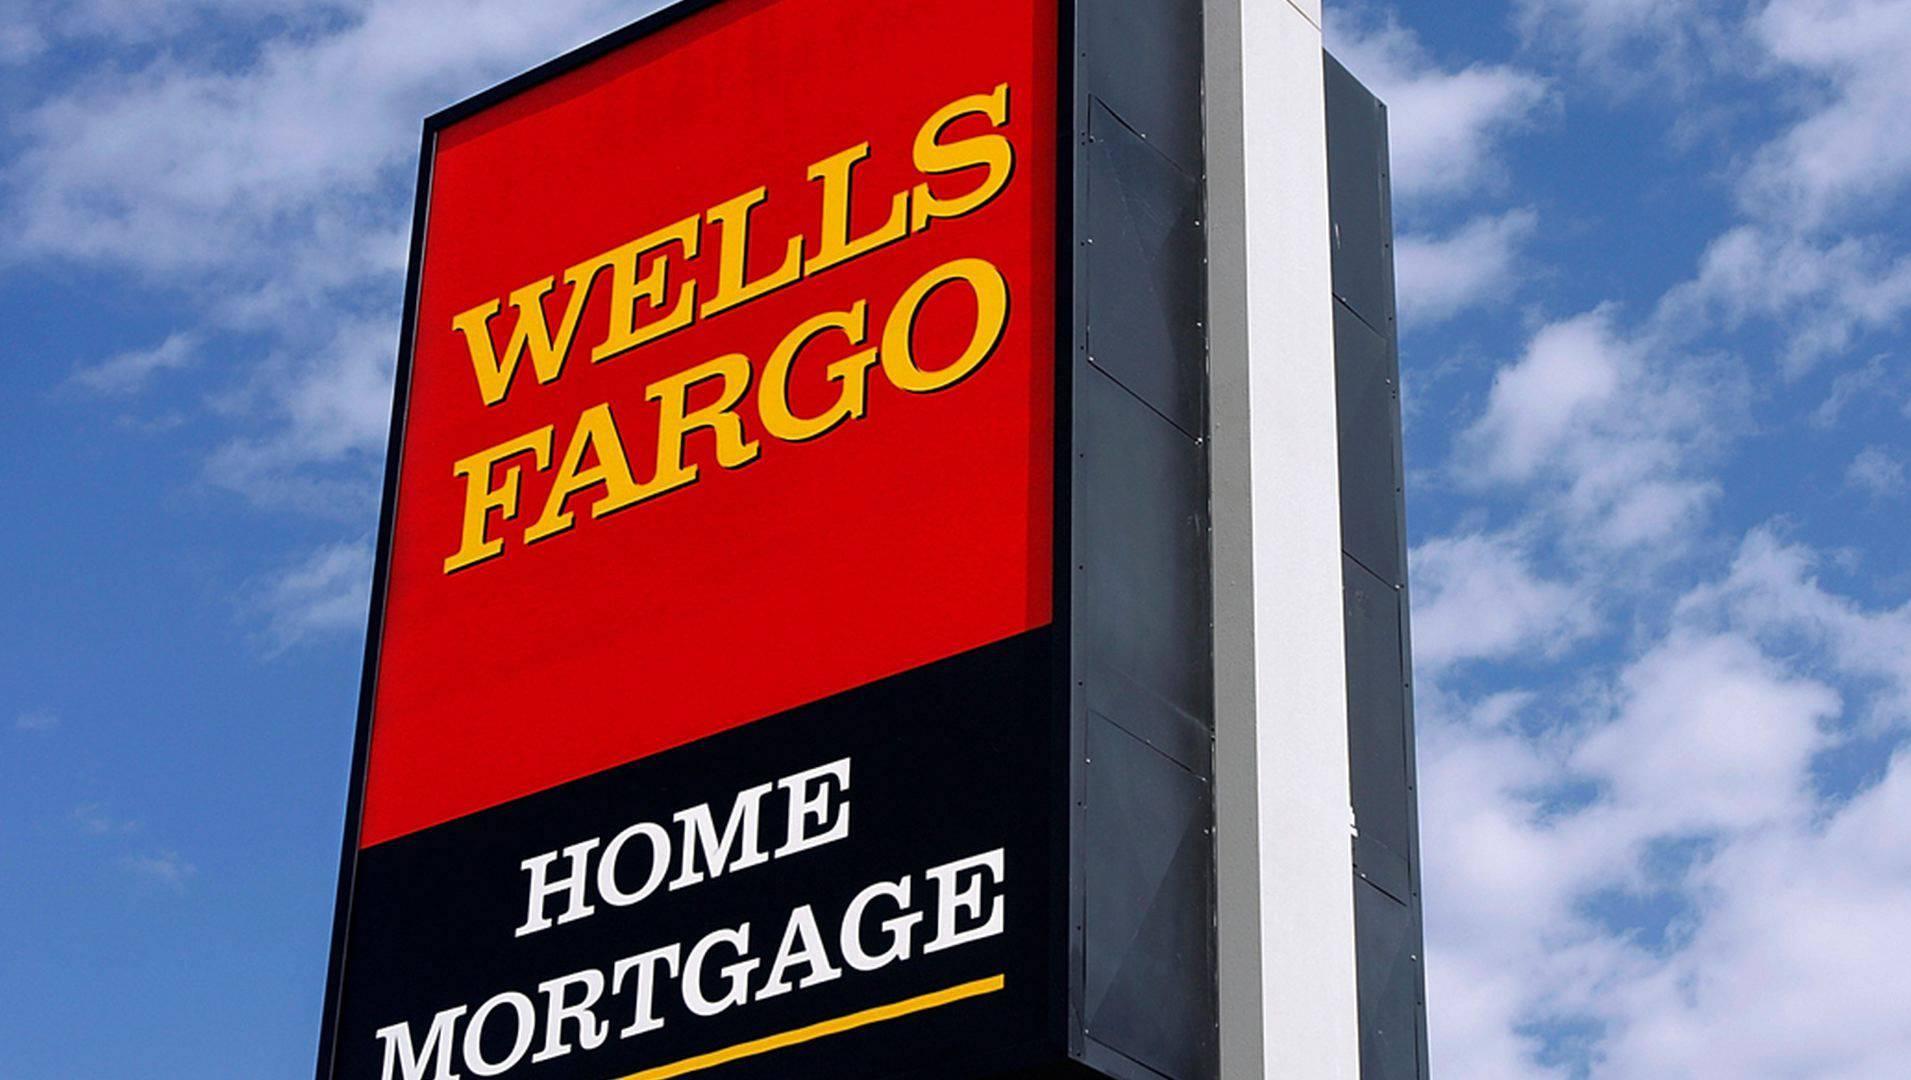 wells fargo management essay The organizational chart of wells fargo displays its 368 main executives including timothy sloan, john shrewsberry, perry pelos and richard levy.